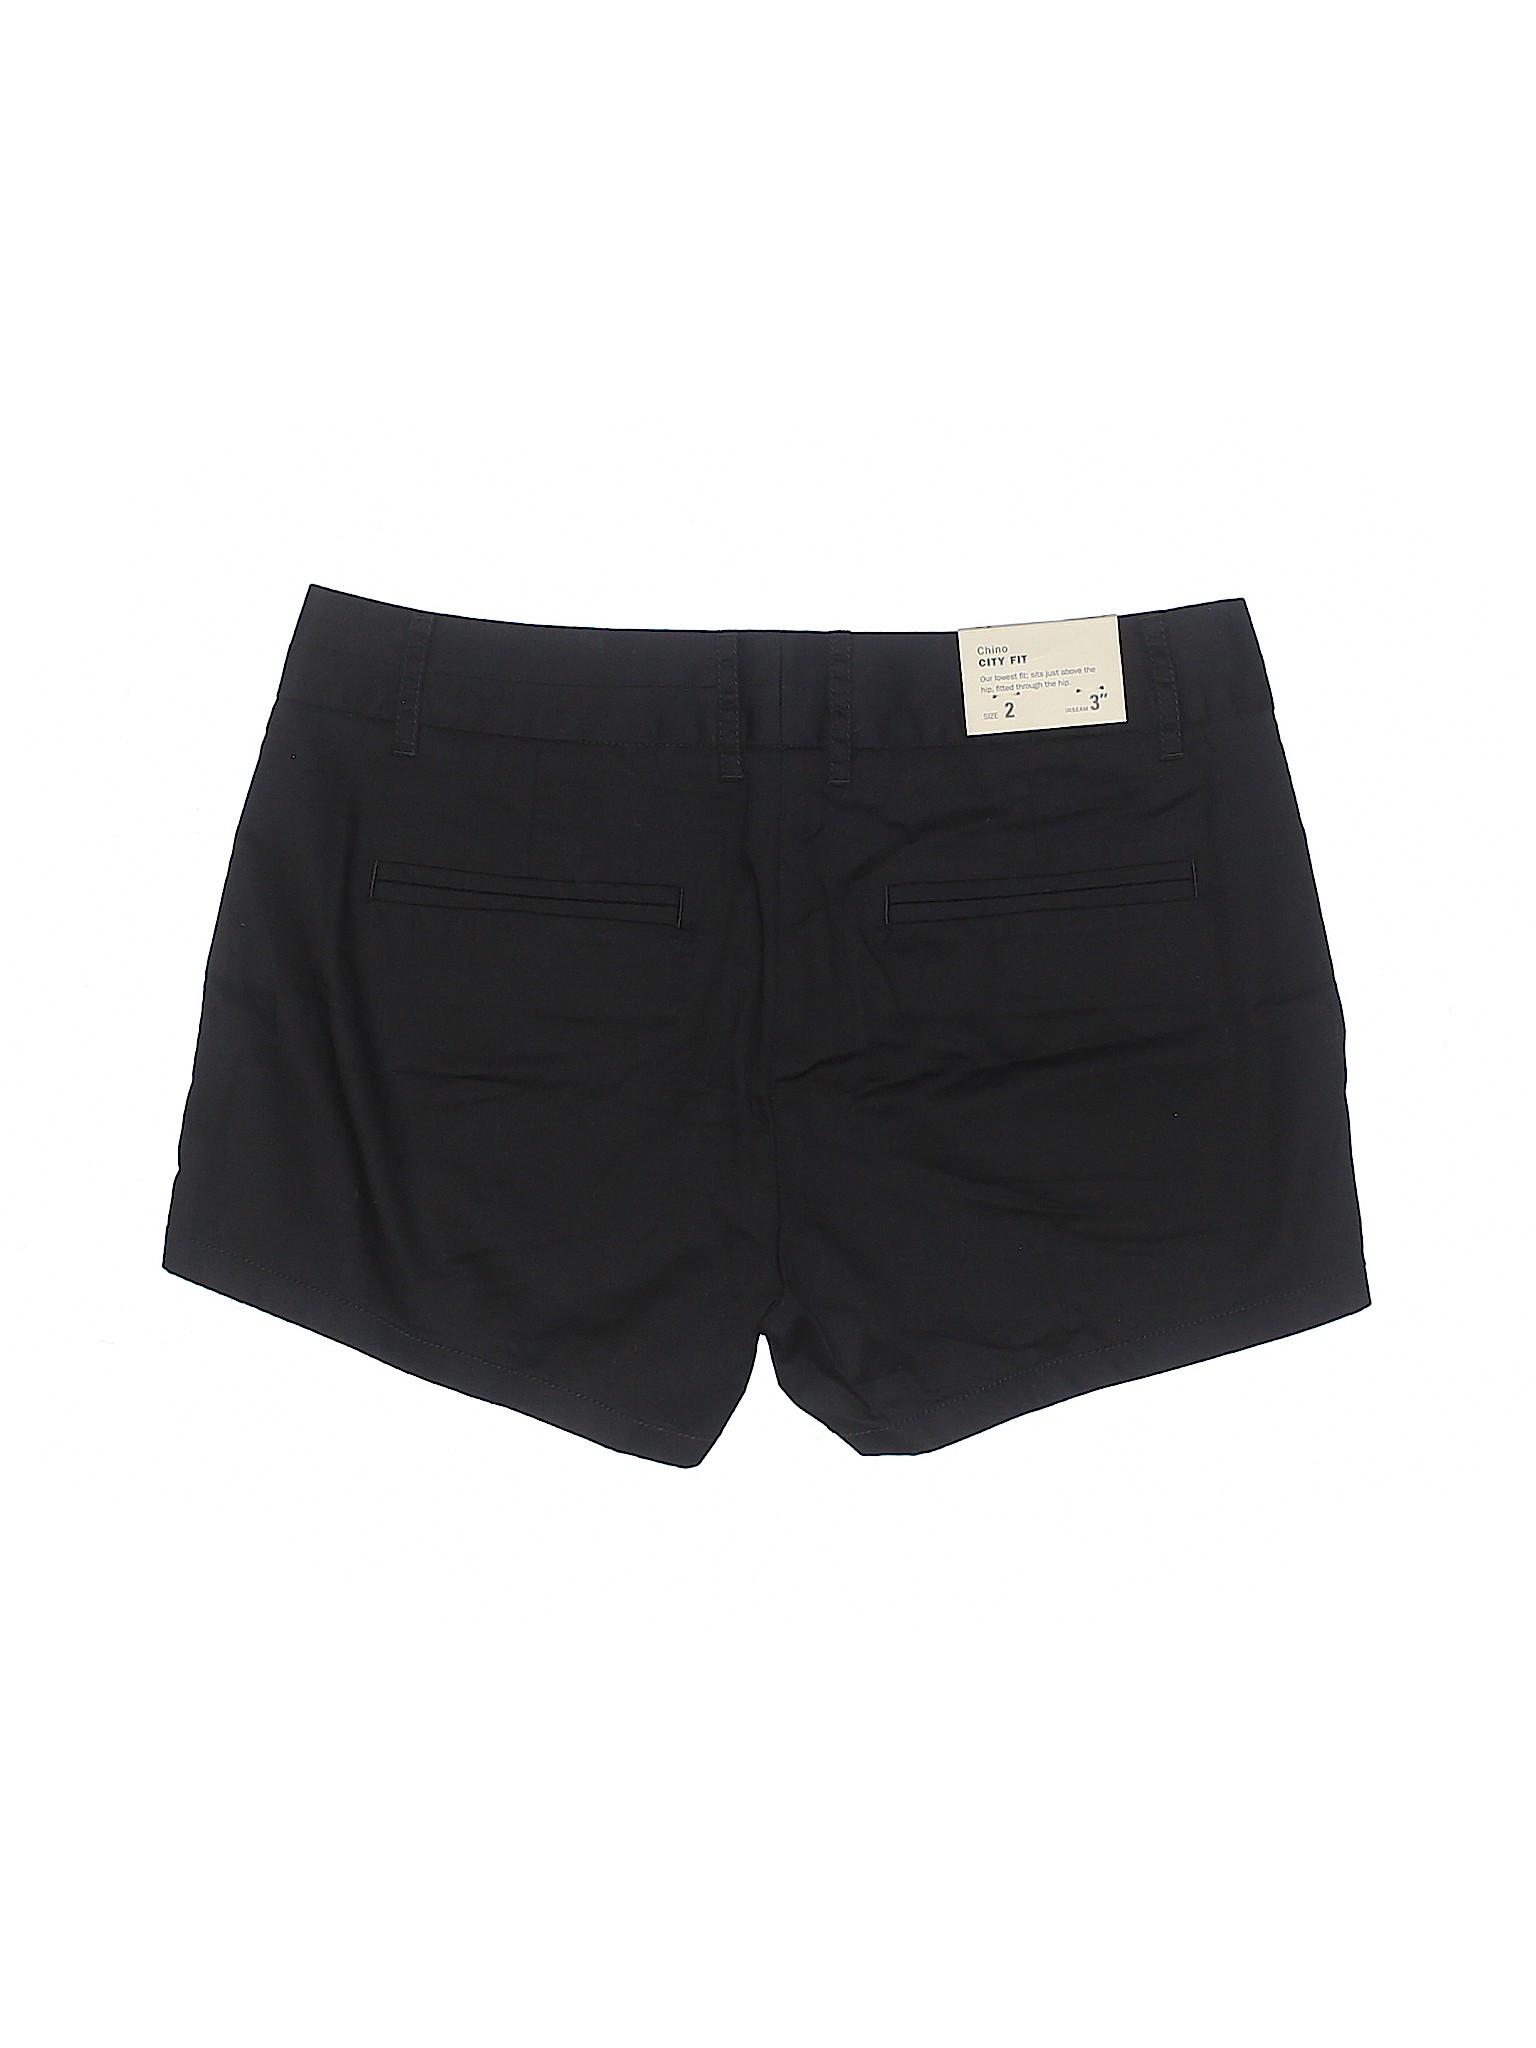 Shorts Khaki Boutique Store Crew J Factory zxf1pq